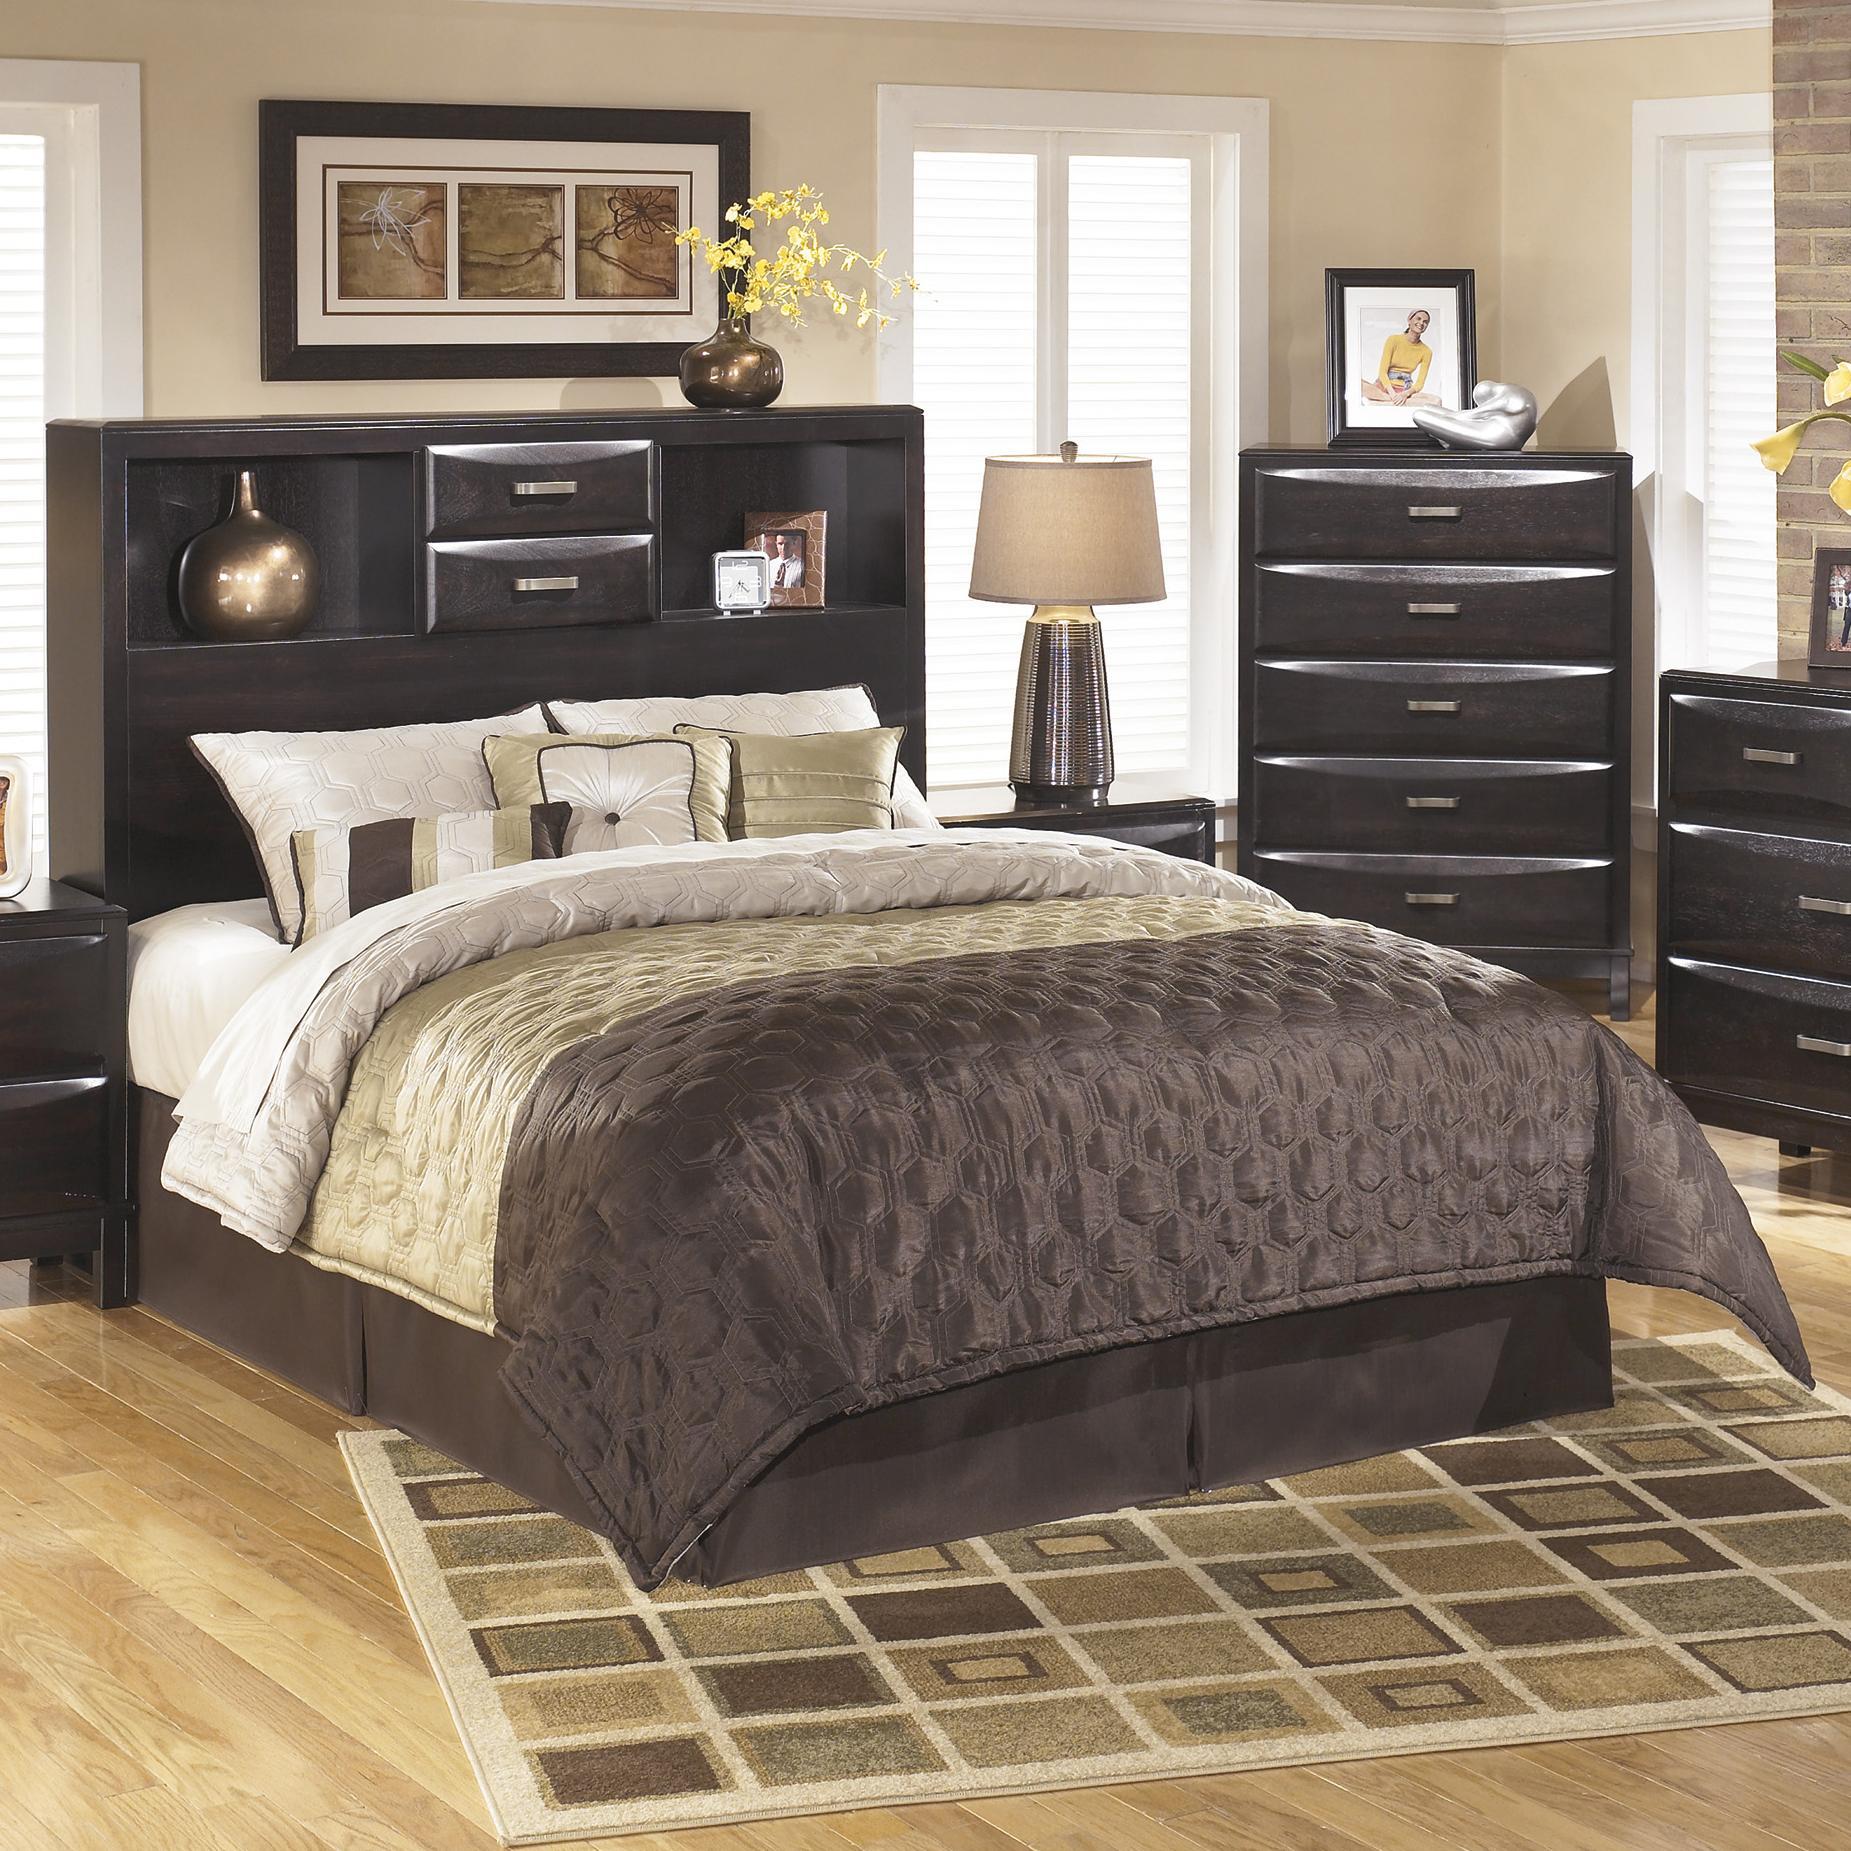 Superieur Ashley Furniture KiraQueen Storage Headboard ...